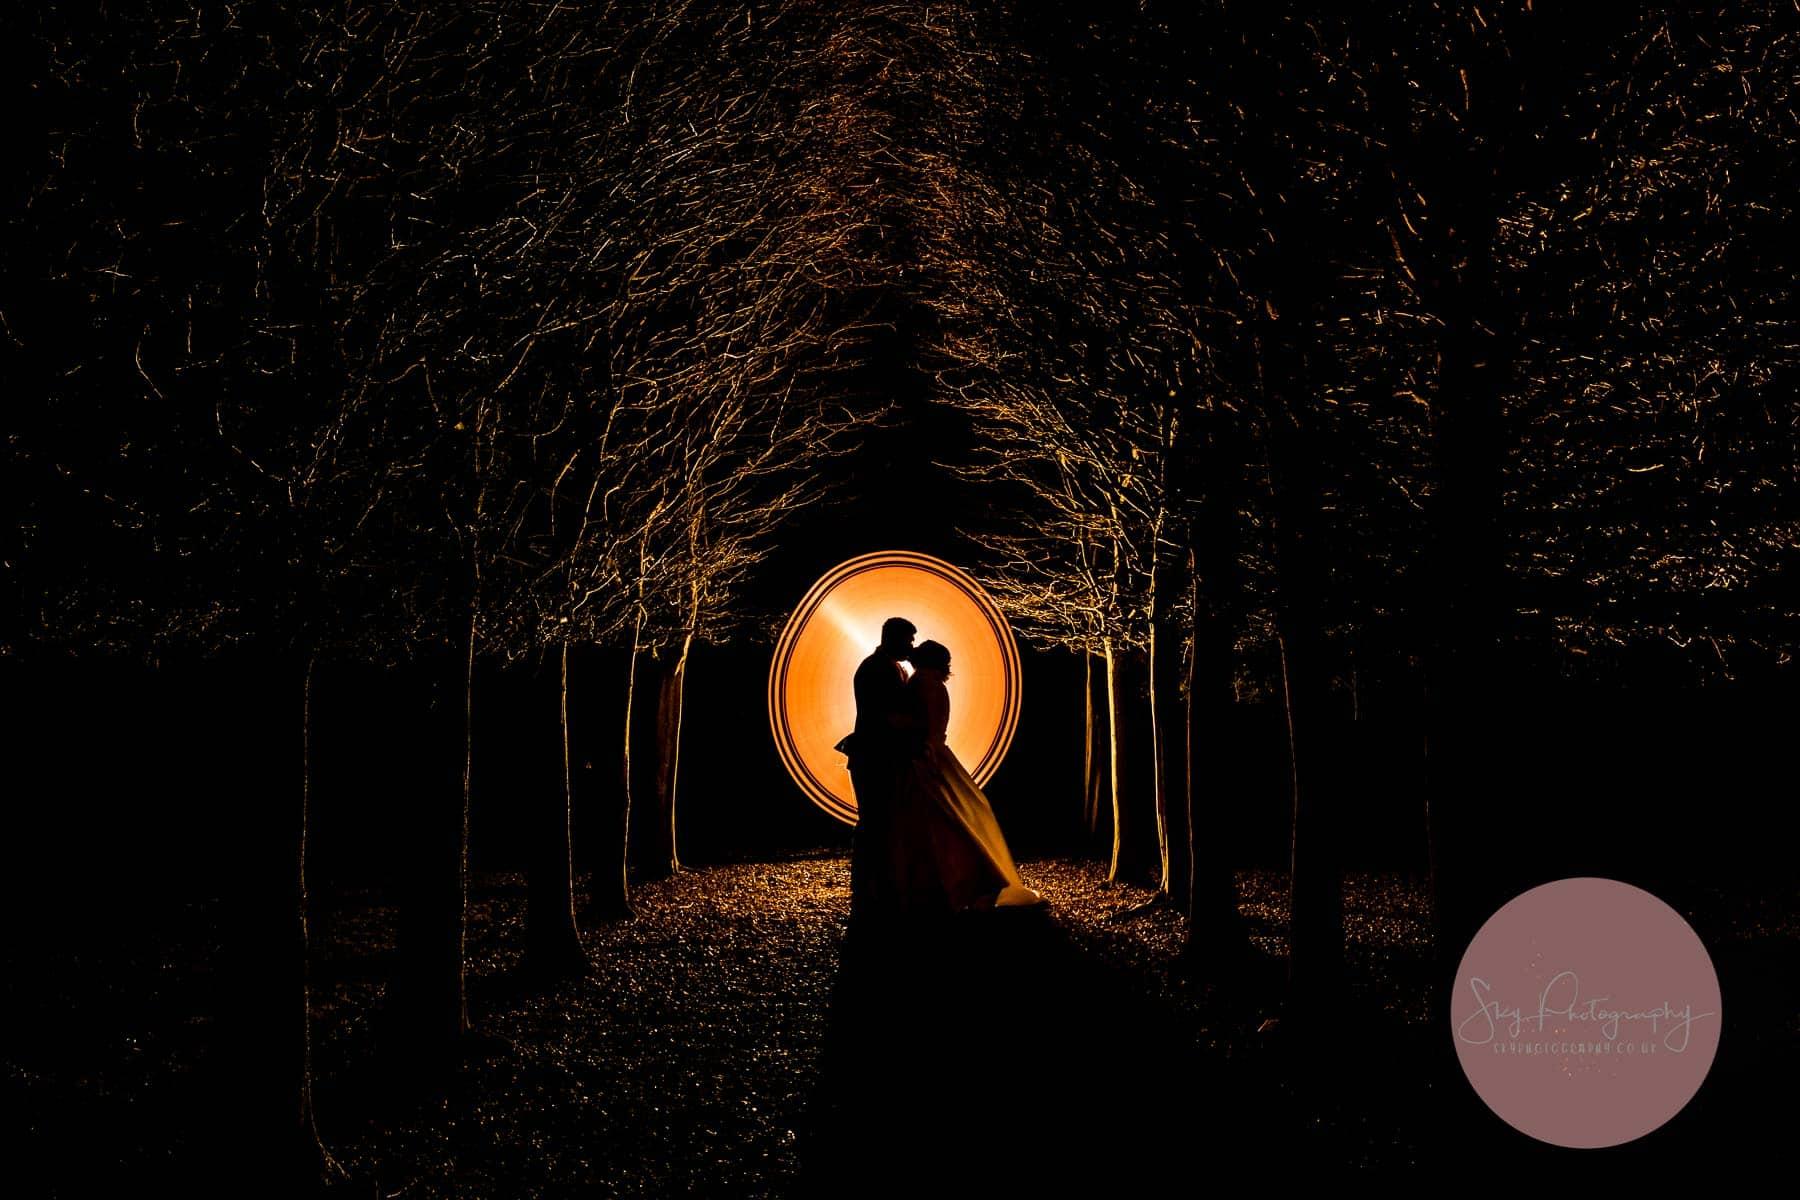 Fawsley Hall Wedding Photographer taking a stunning night magmod photo